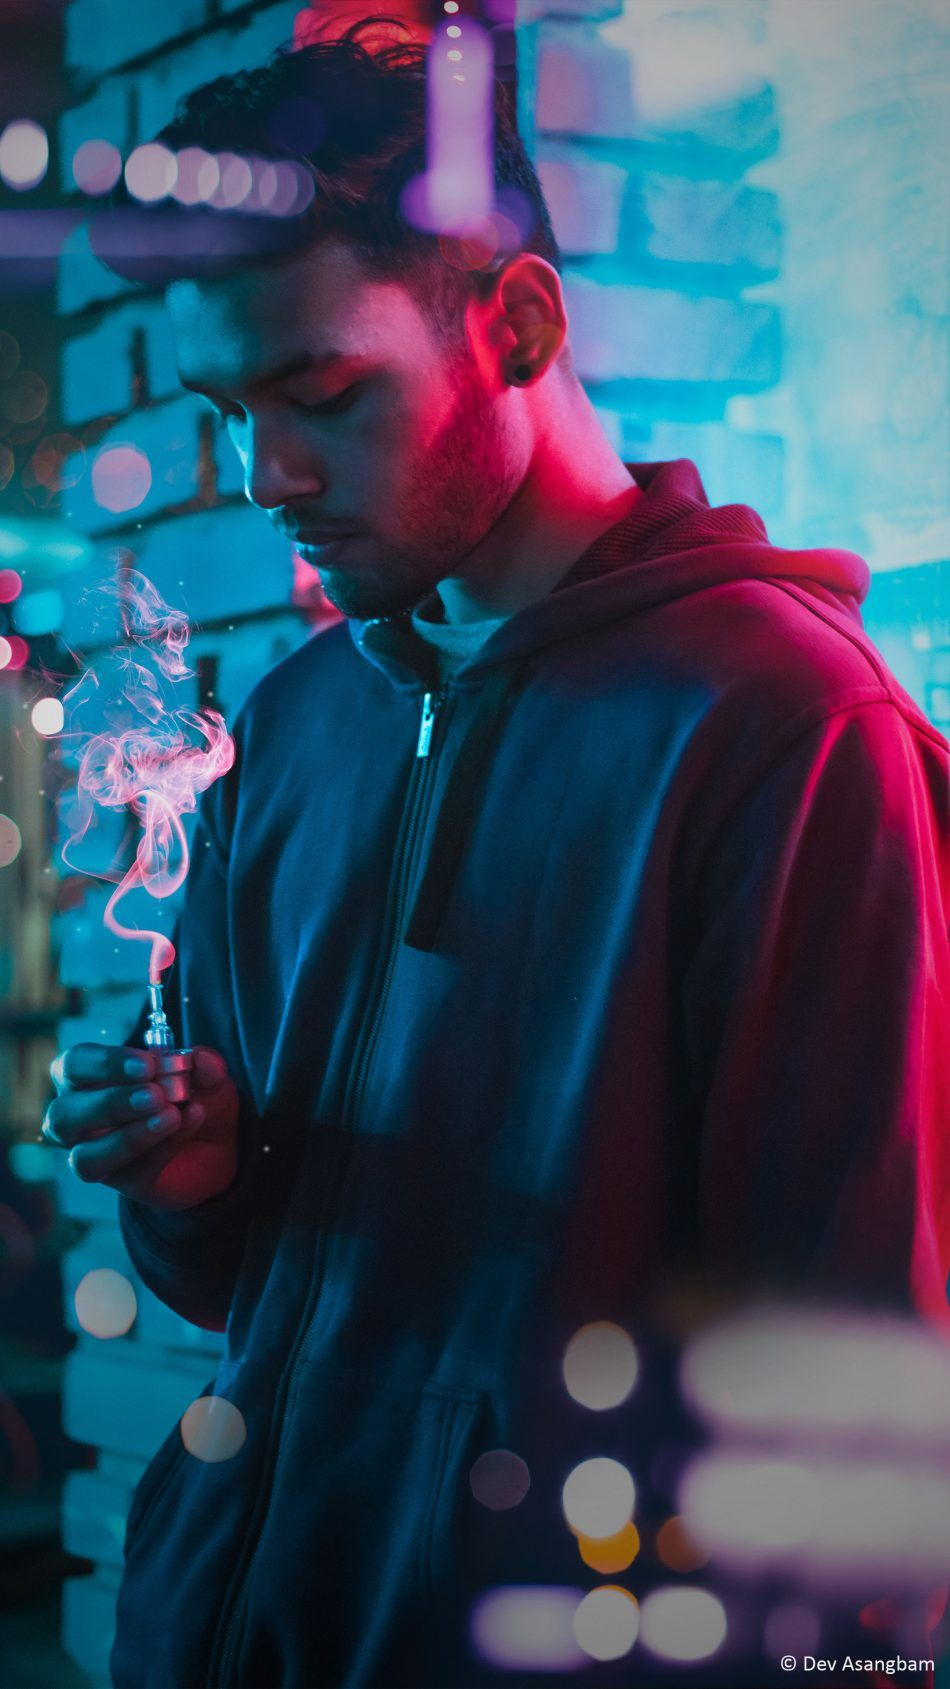 Boy Neon Broken Light Bulb Photography 4k Ultra Hd Mobile Wallpaper Bulb Photography Album Photography Android Photography